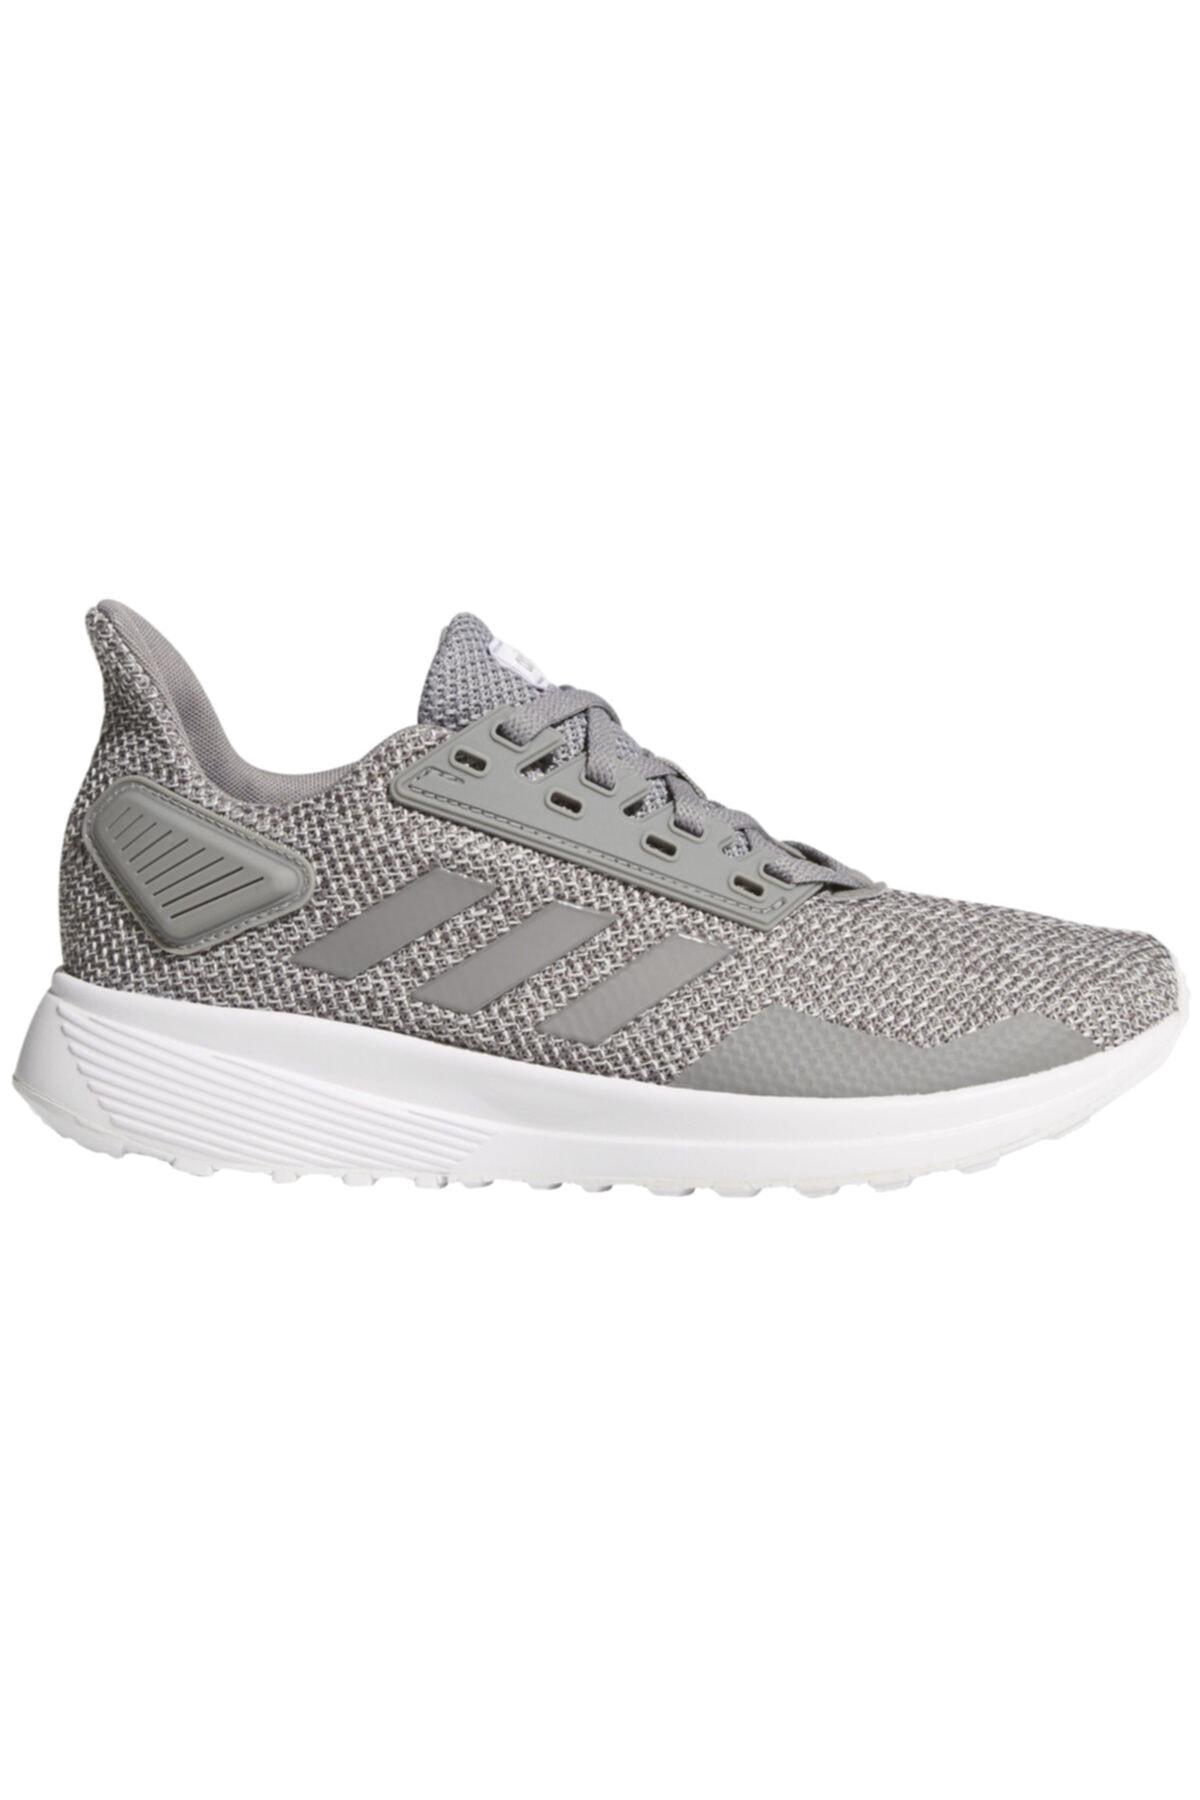 adidas Duramo 9 K (gs) Spor Ayakkabı 1